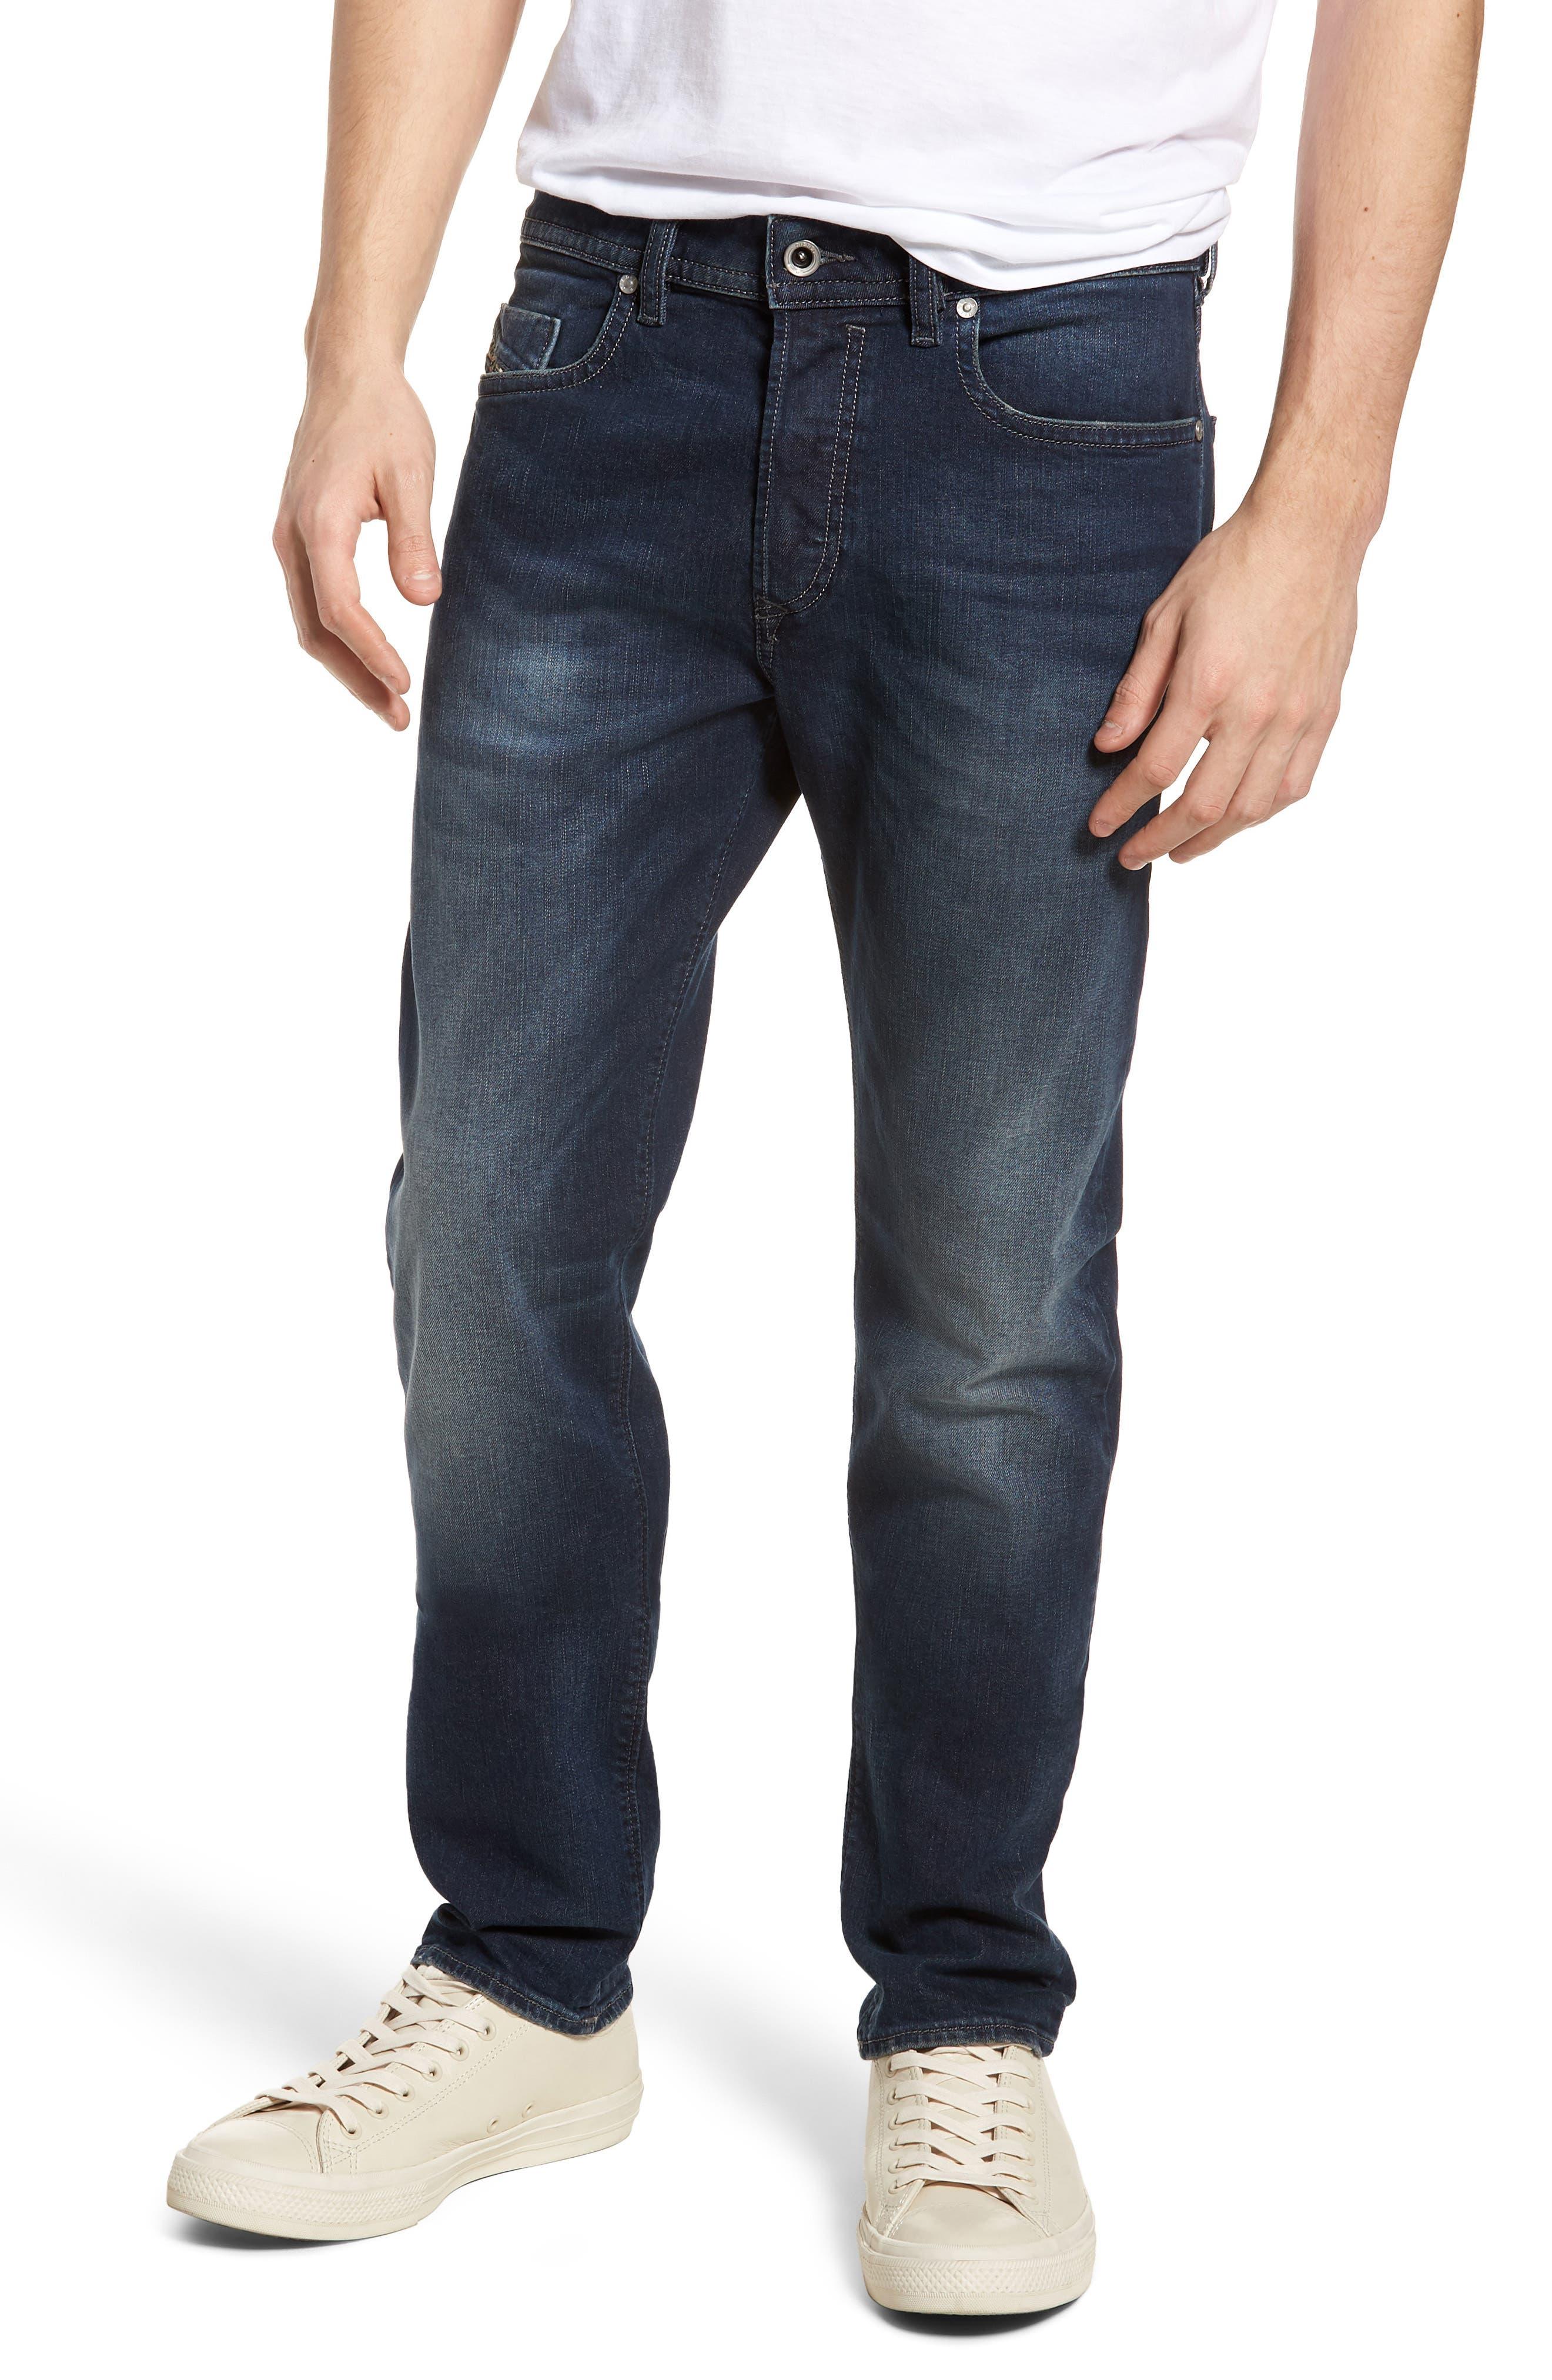 Buster Slim Straight Leg Jeans,                             Main thumbnail 1, color,                             Blue